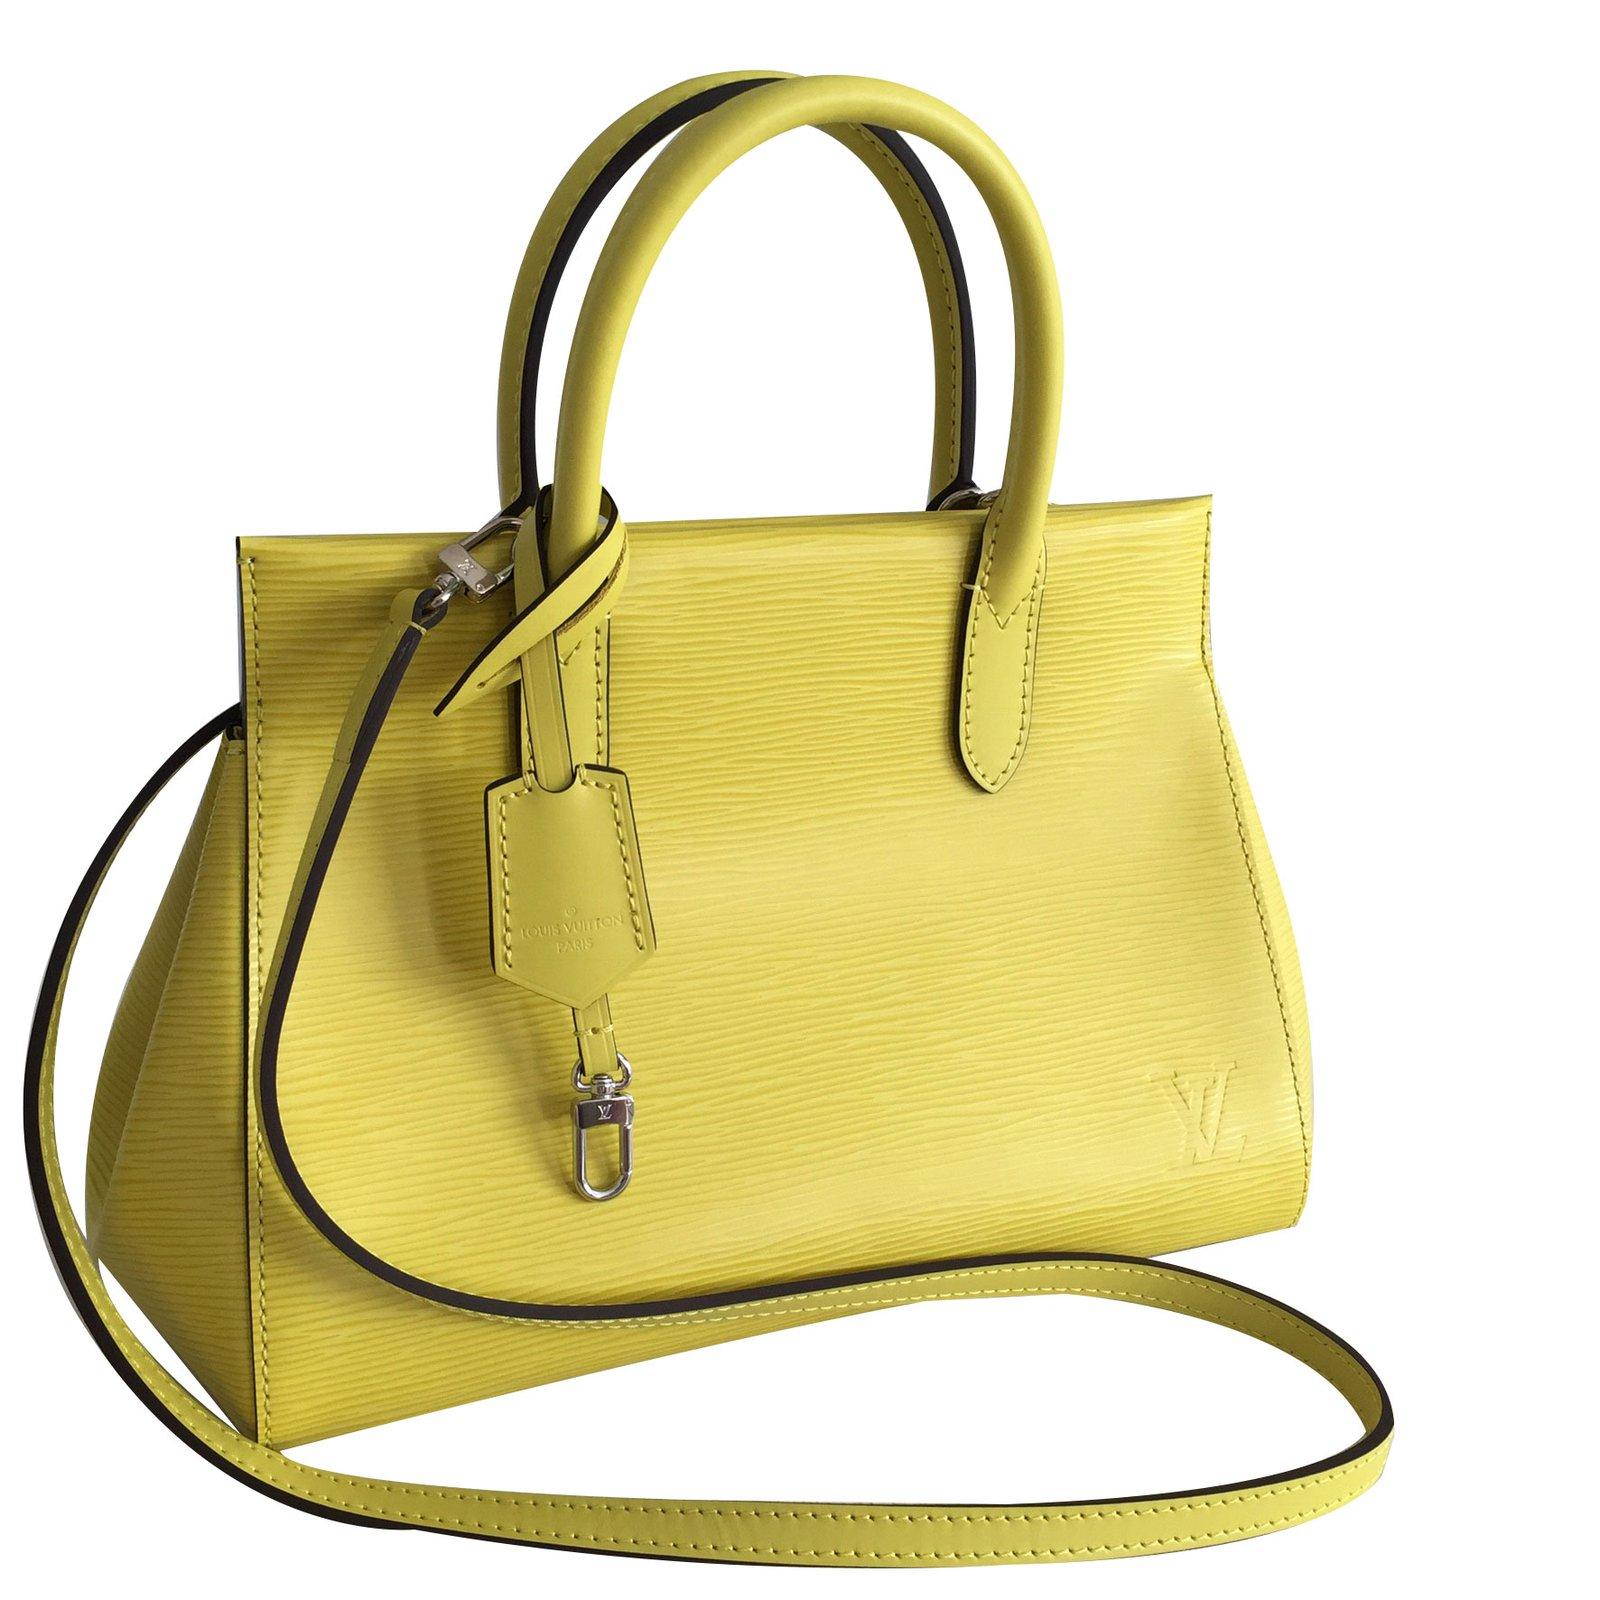 21fe65e3046f Louis Vuitton Marly BB Handbags Leather Yellow ref.70833 - Joli Closet